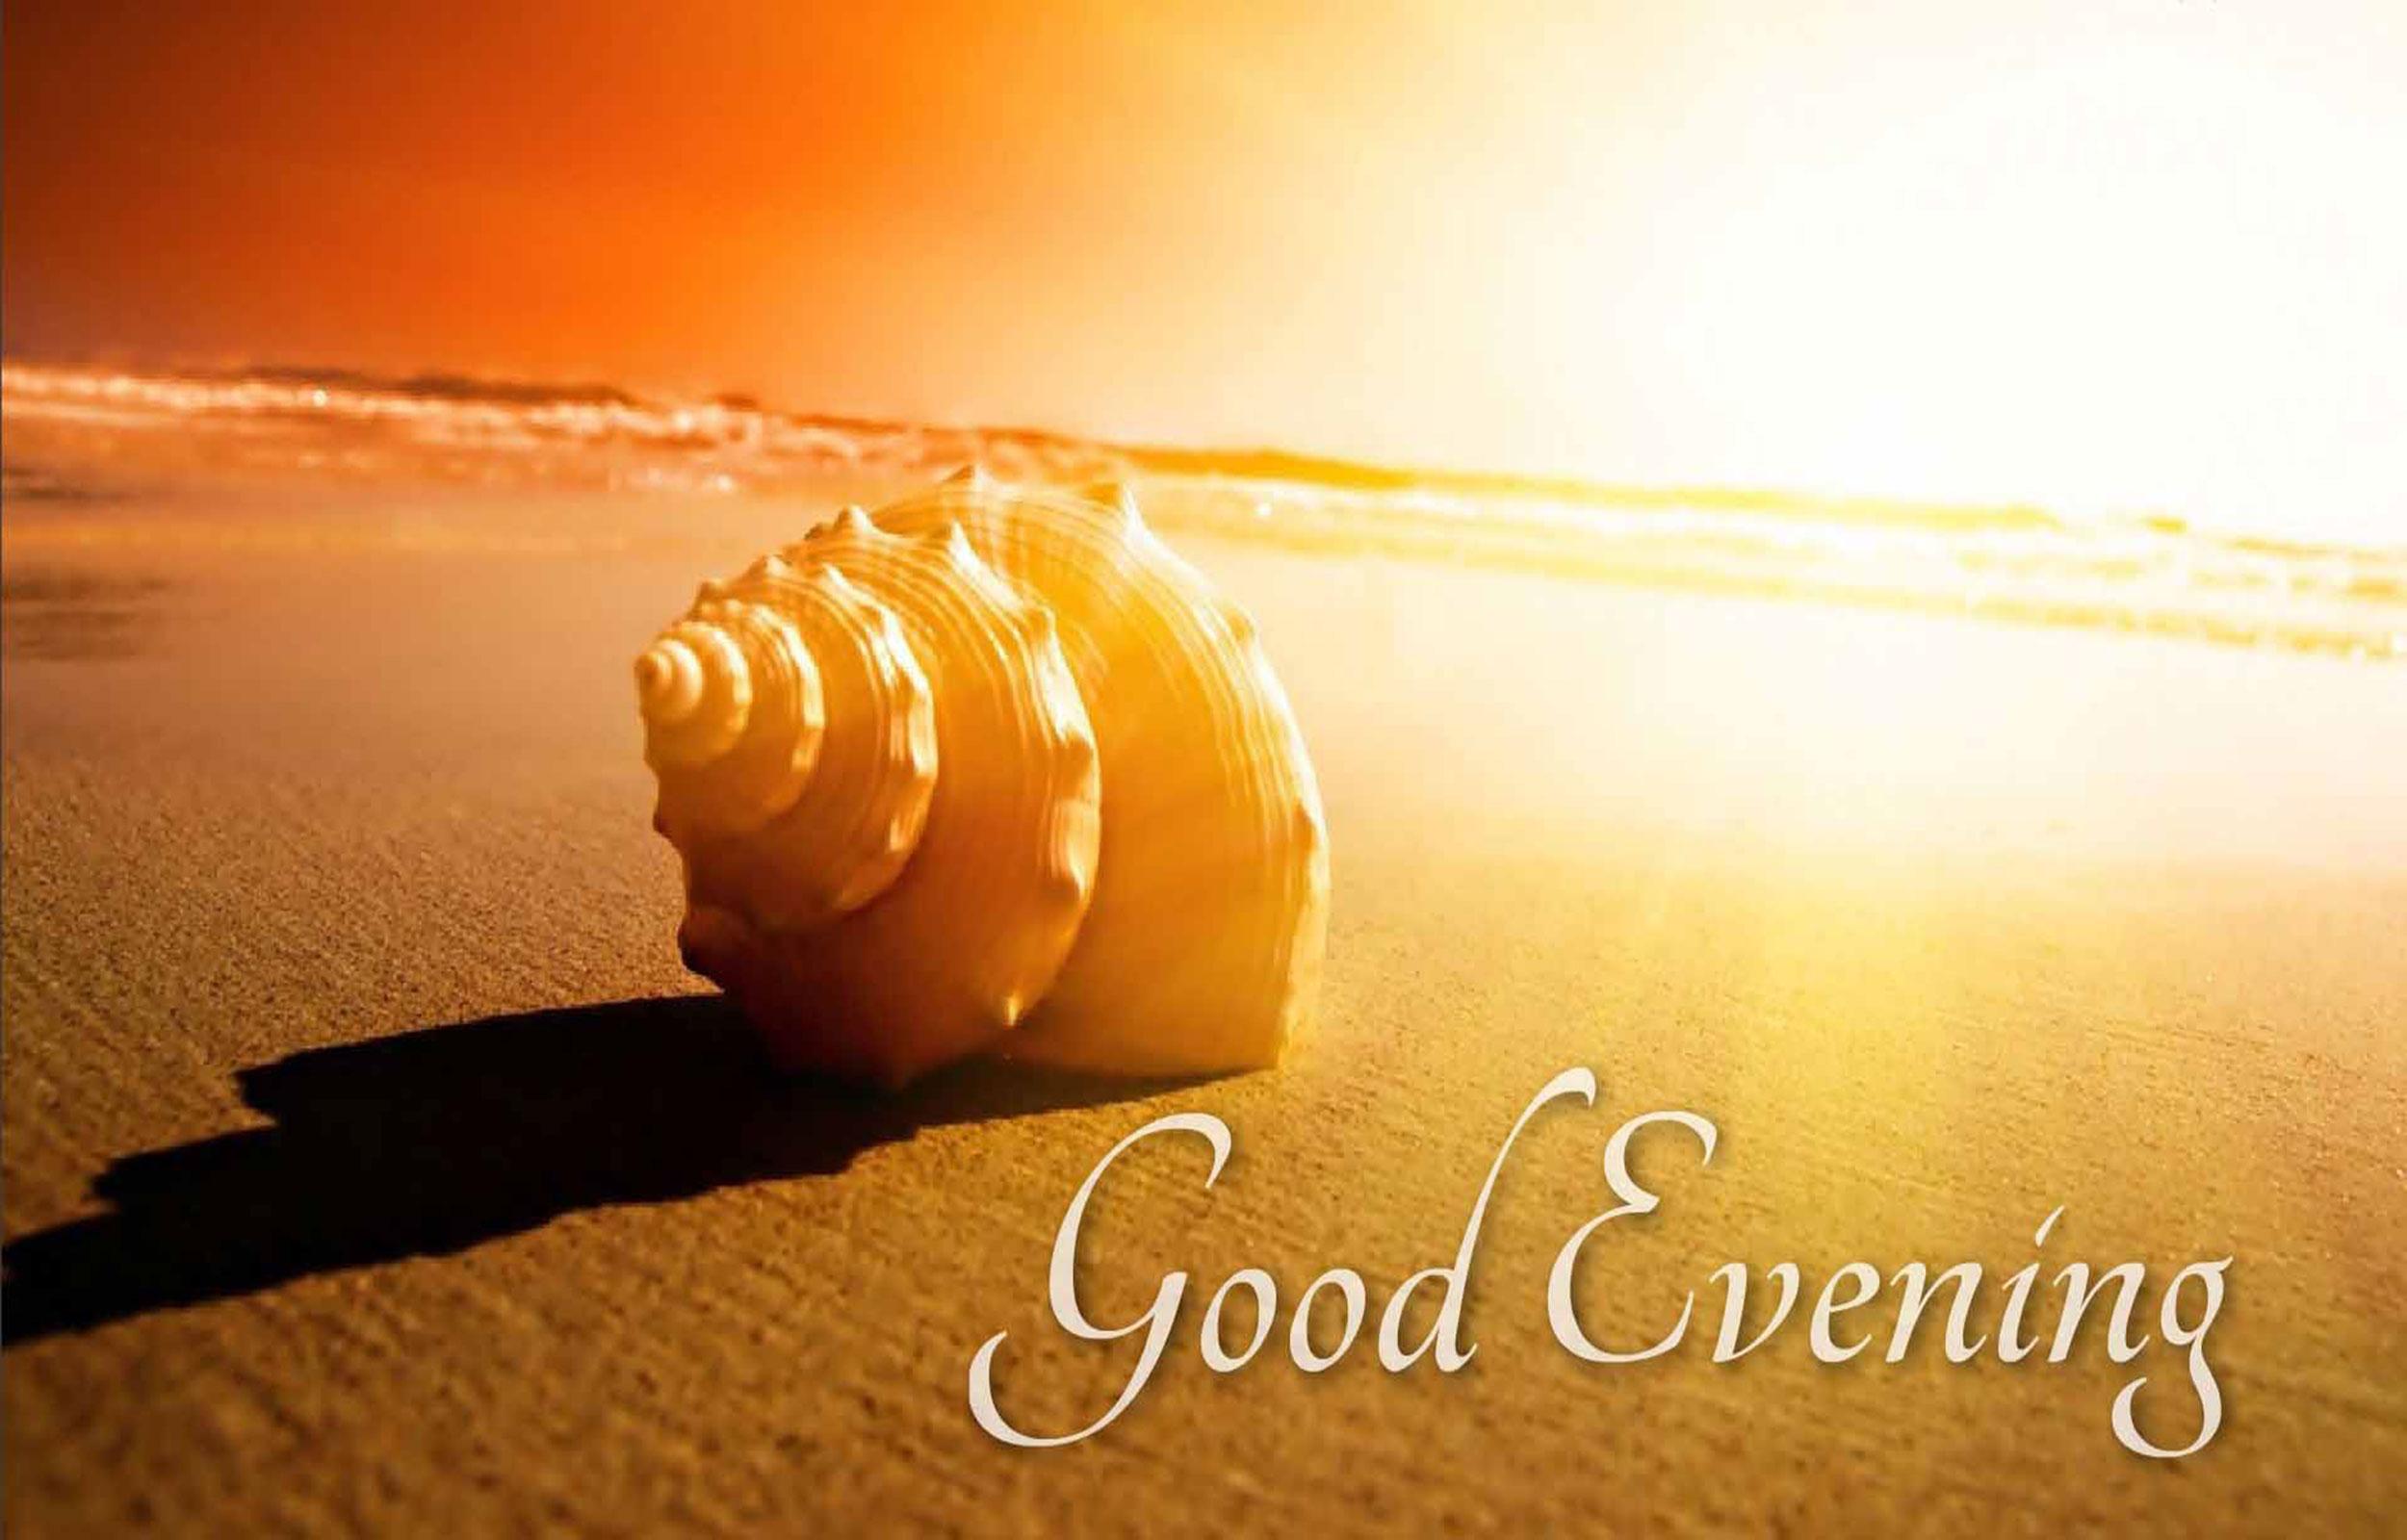 Good Evening Wish Sea Shell